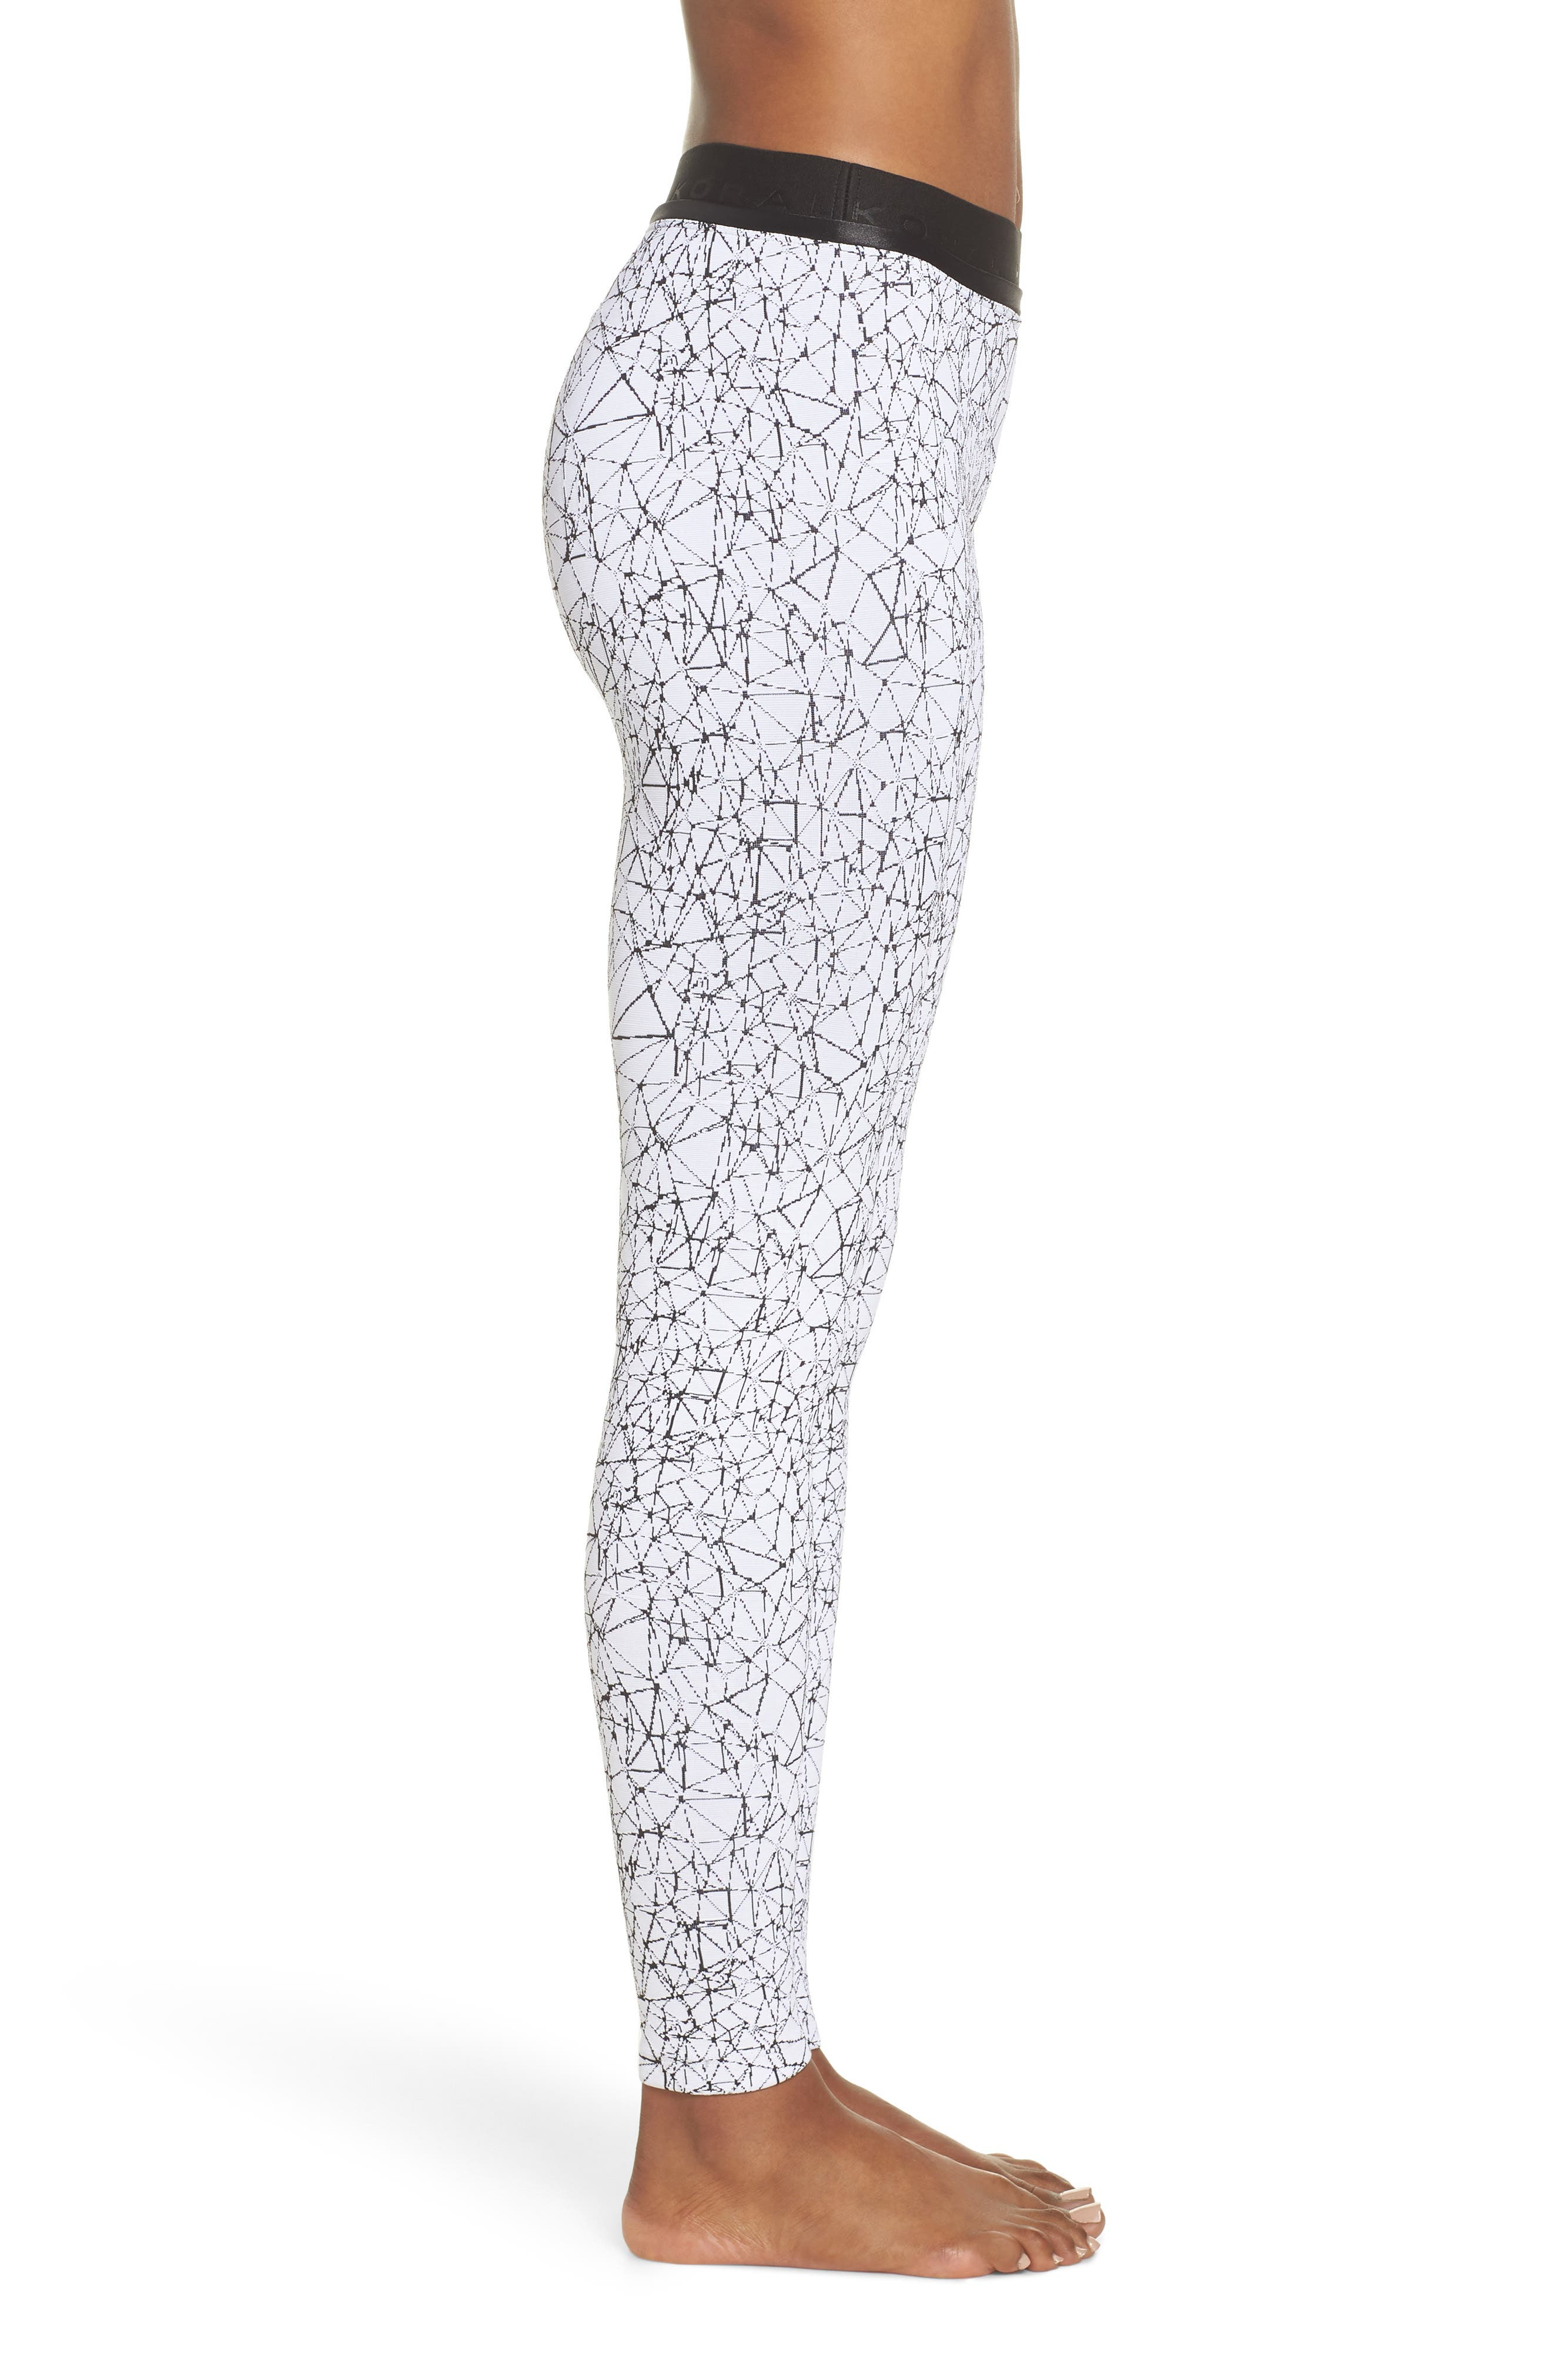 Molecular Sloane High Waist Leggings,                             Alternate thumbnail 3, color,                             Molecular White/ Black